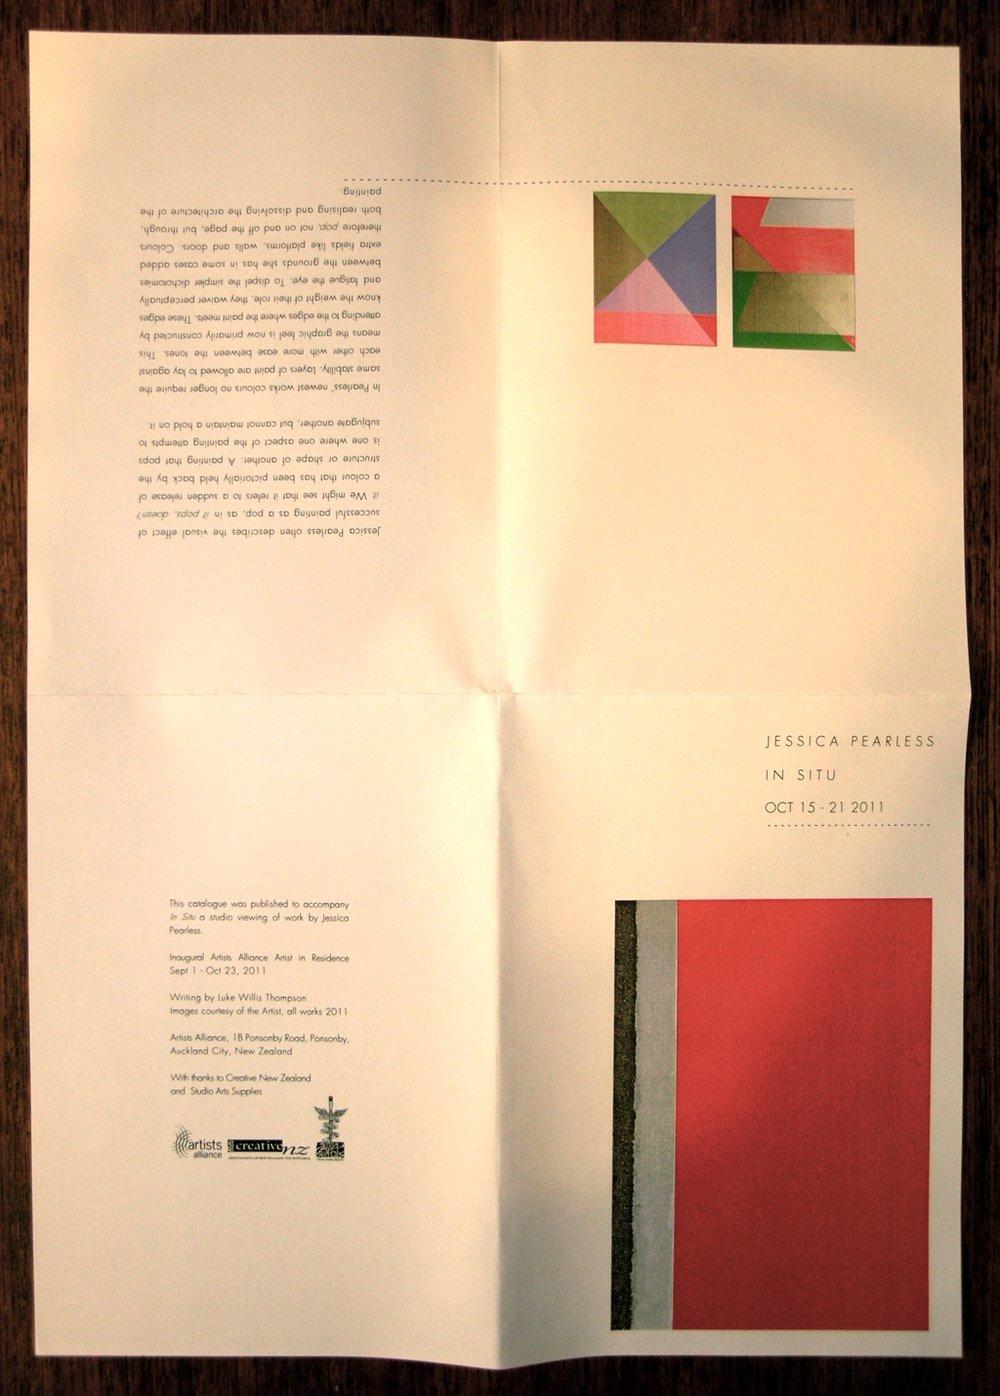 In Situ, Exhibition Publication